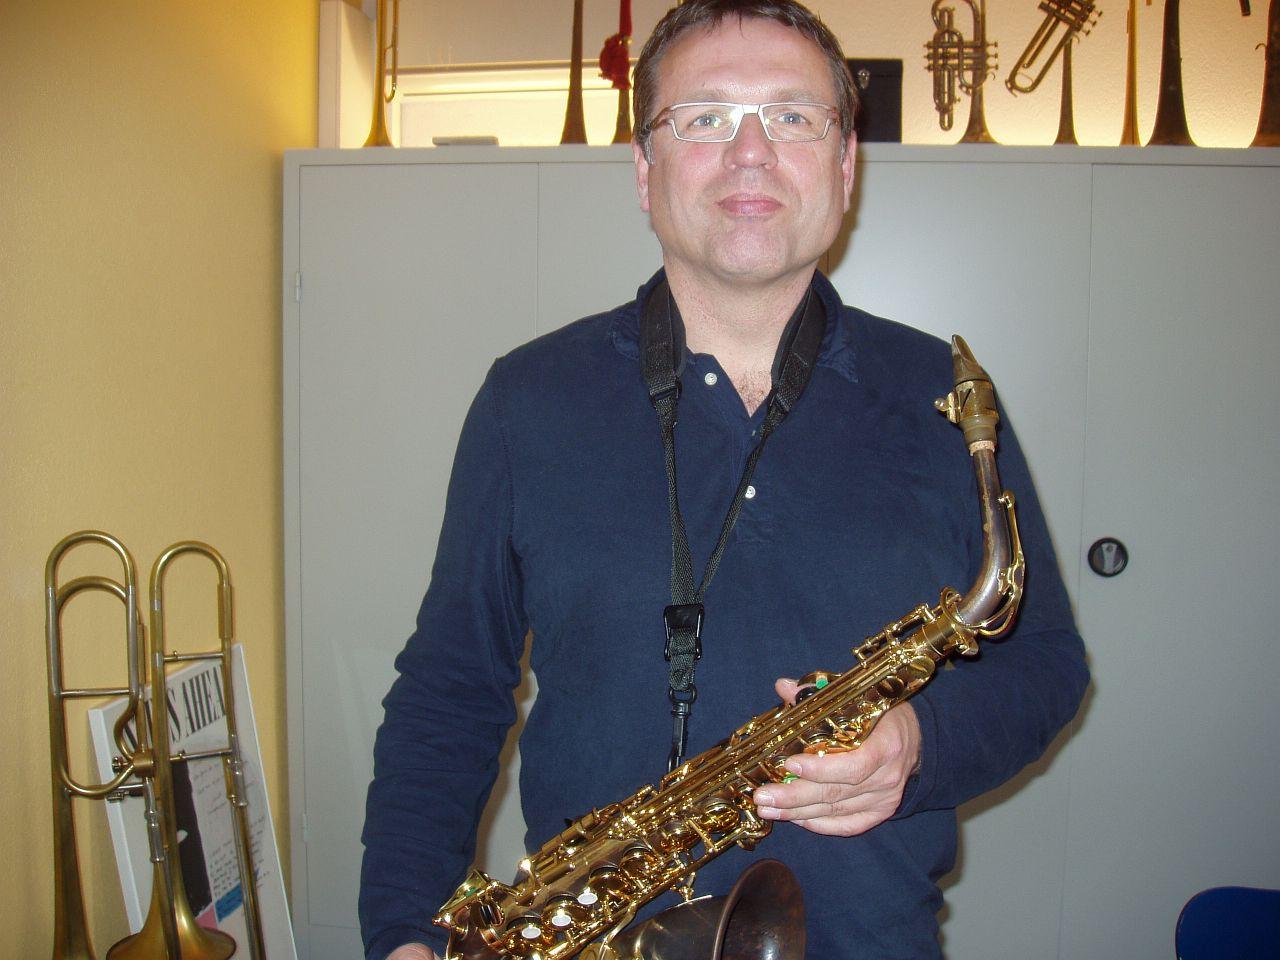 Musiker 106